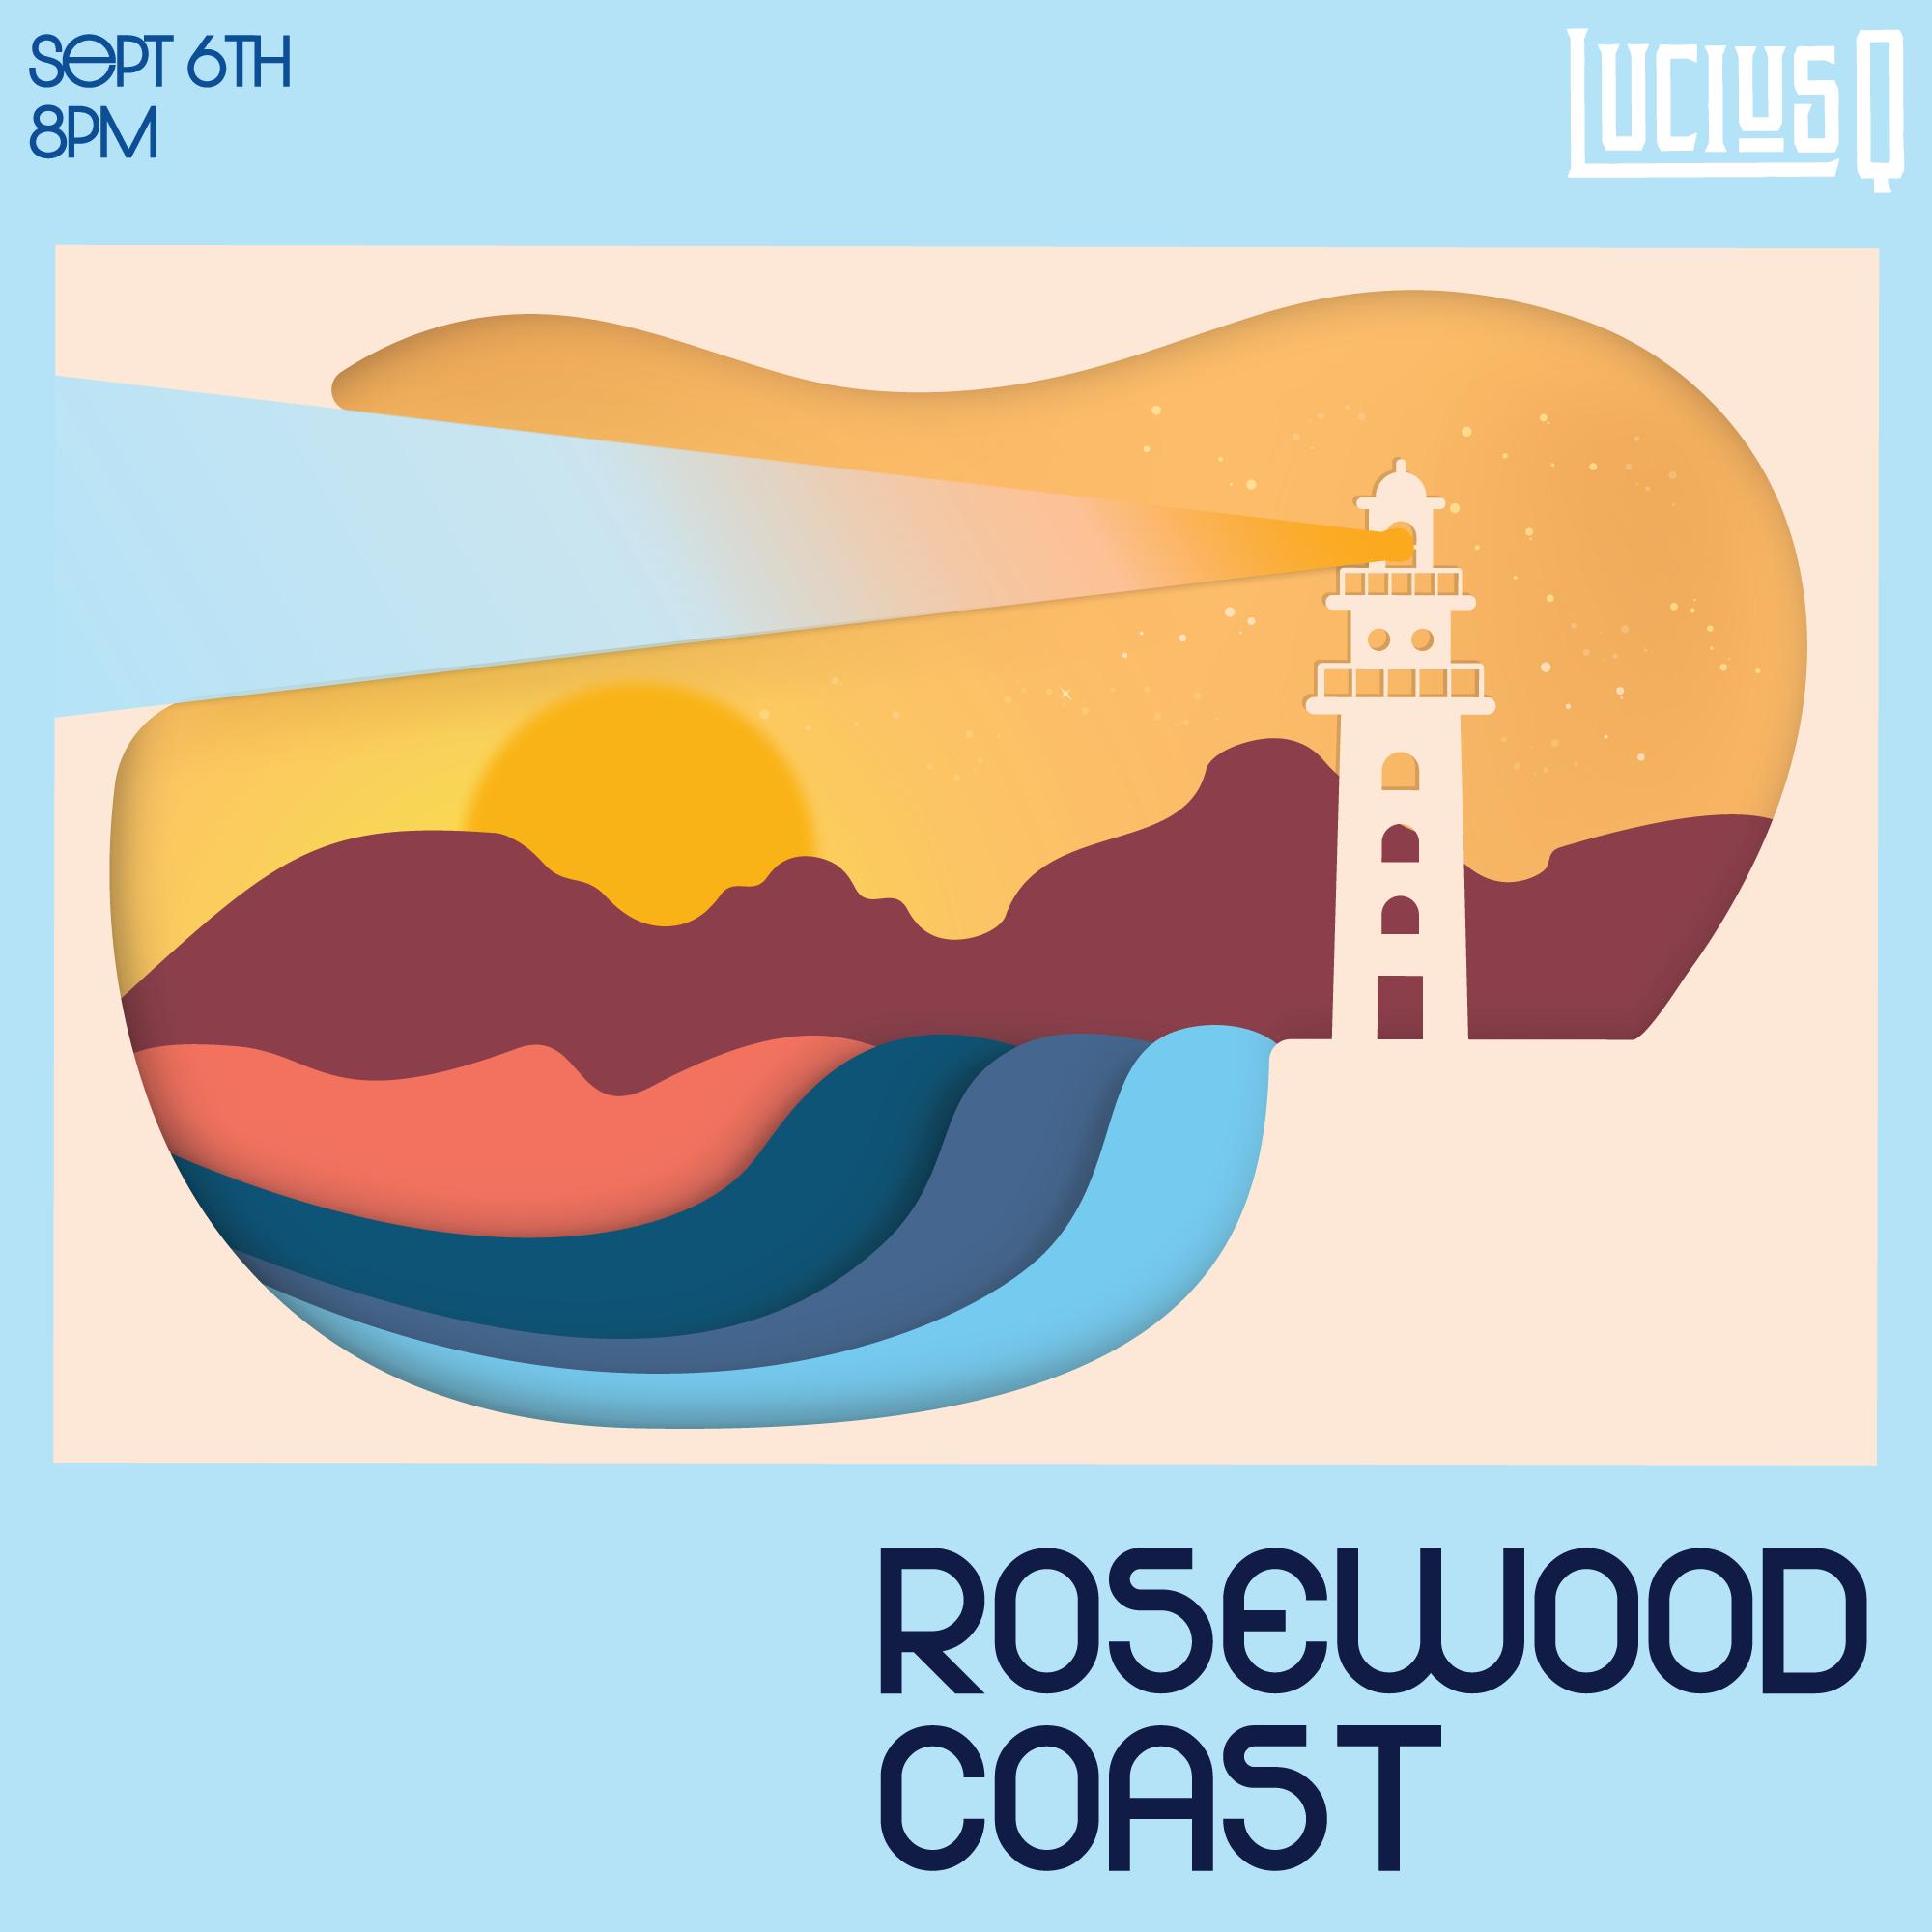 FiR-Creative---LuciusQ---Rosewood-Coast2.png